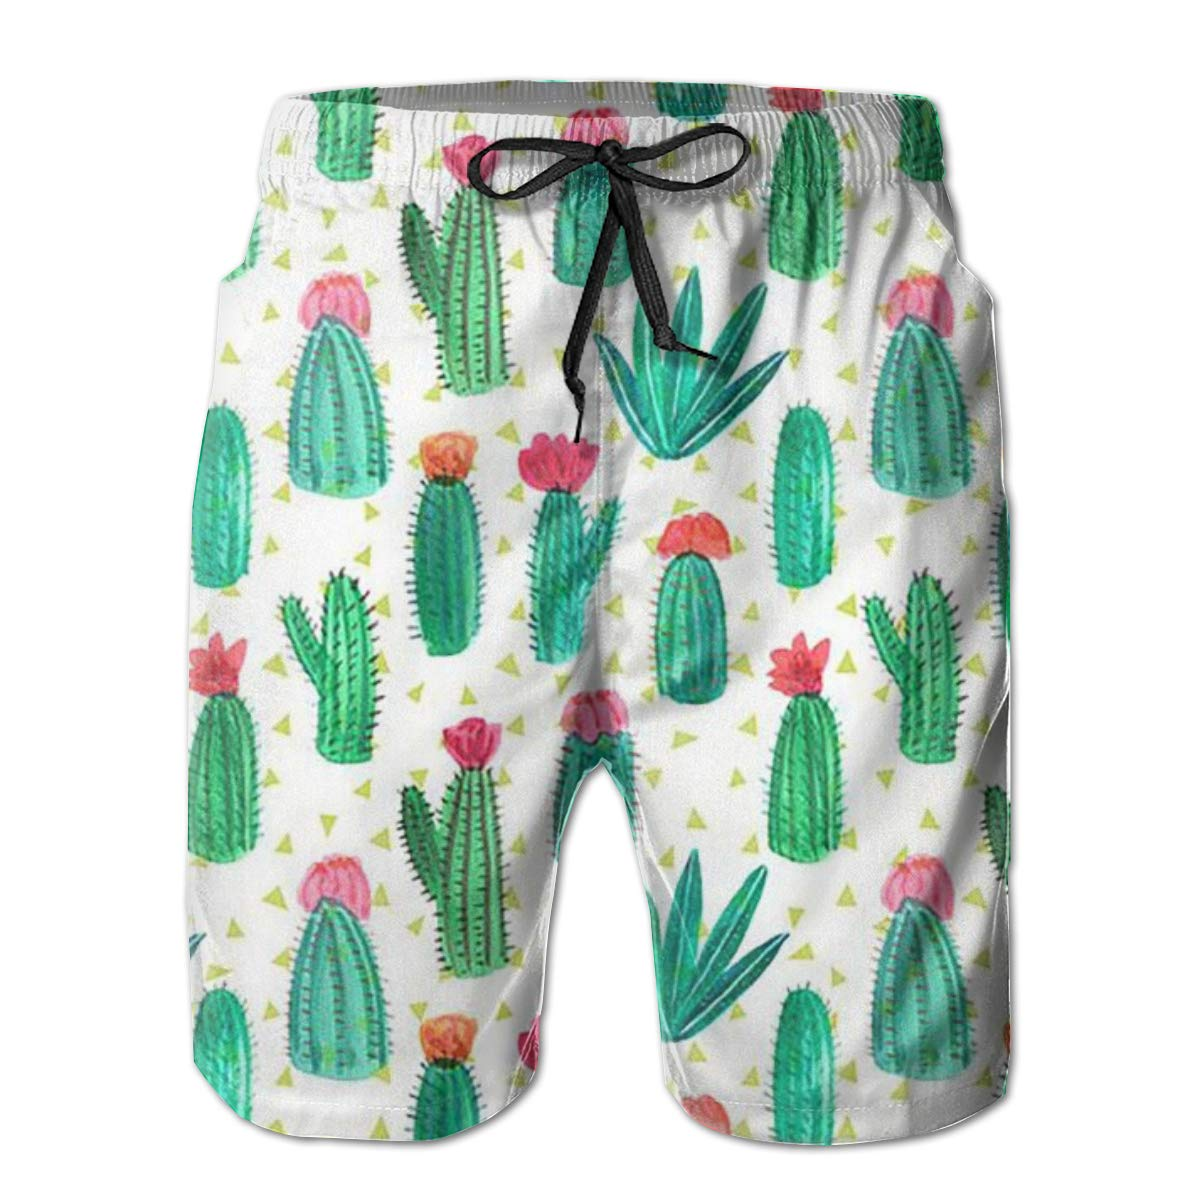 Mens Swim Trunks Quick Dry Summer Holiday Beach Shorts with Mesh Lining Cactus in The Desert Beachwear